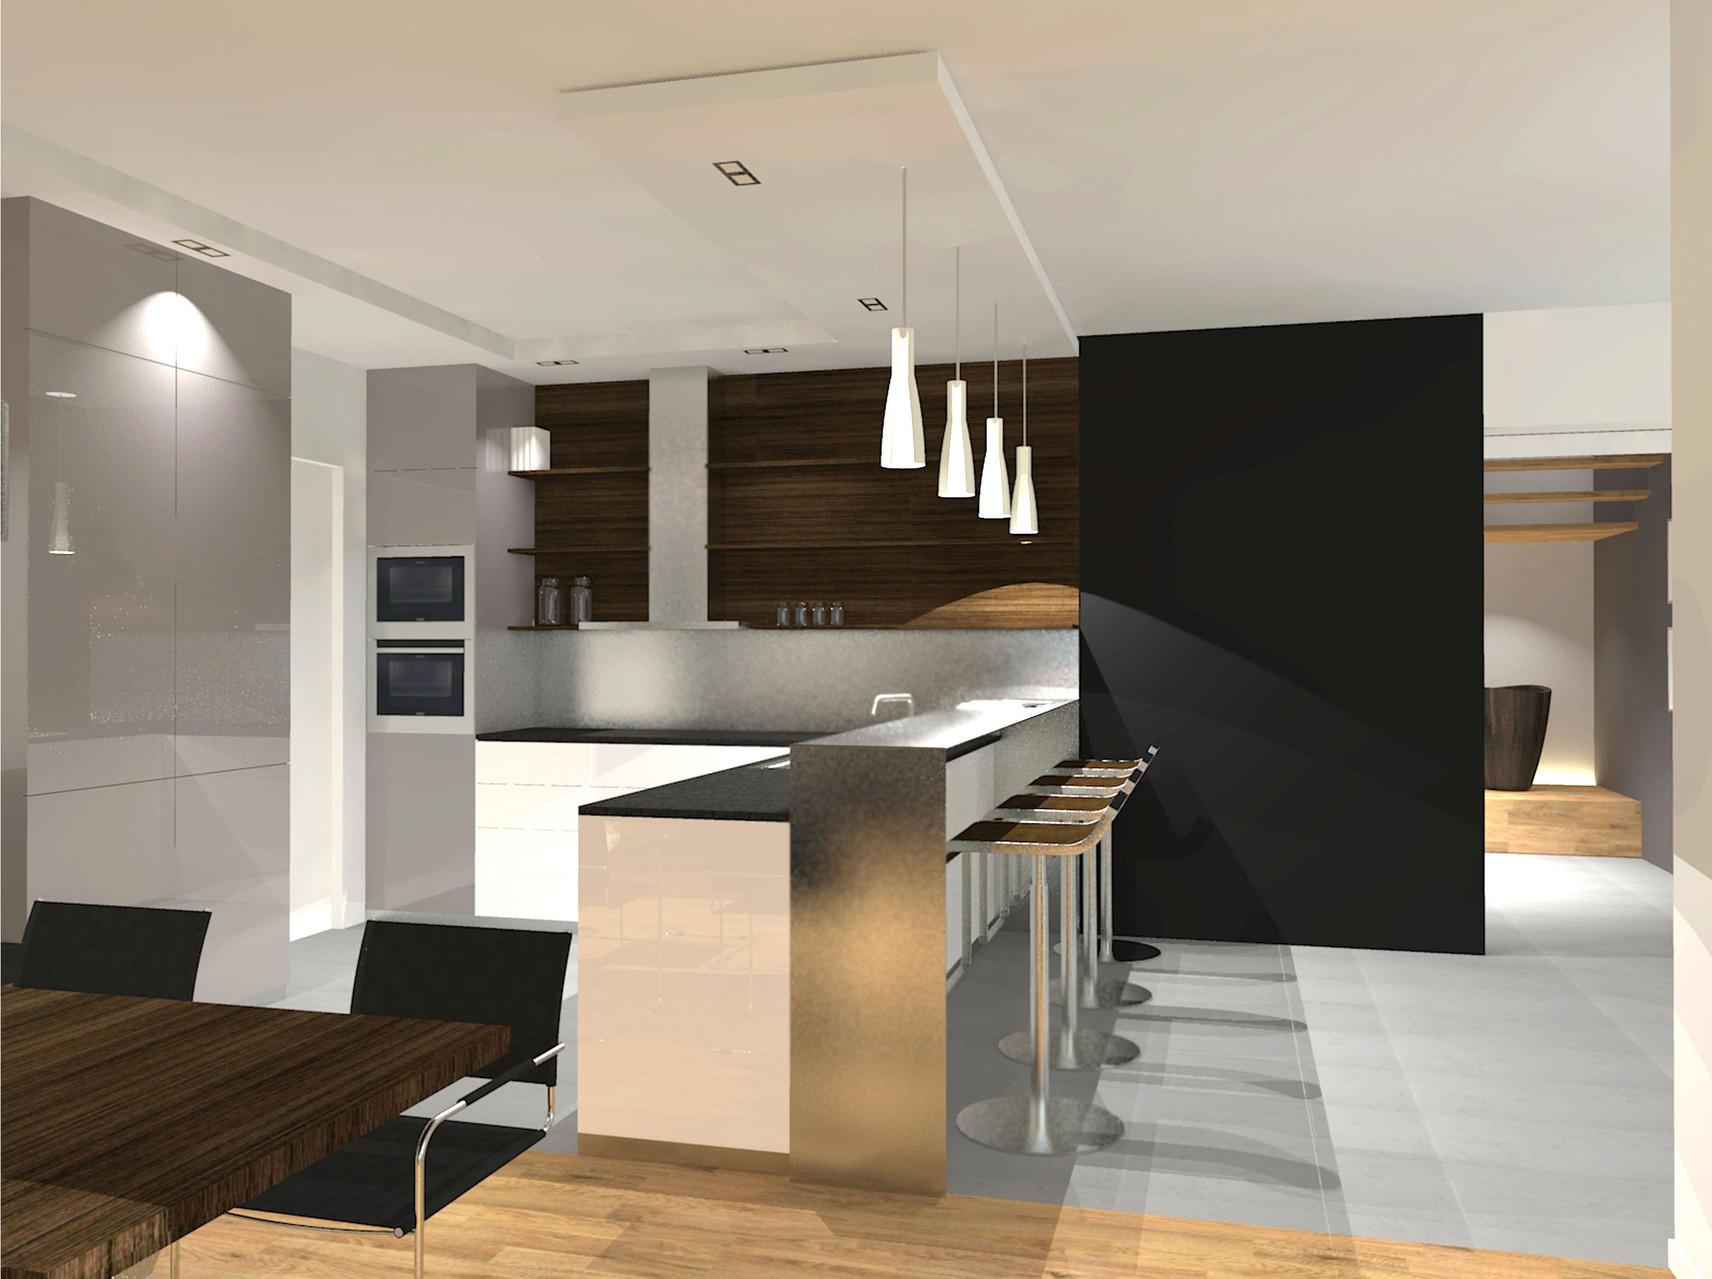 Haus M | Kueche Variante A